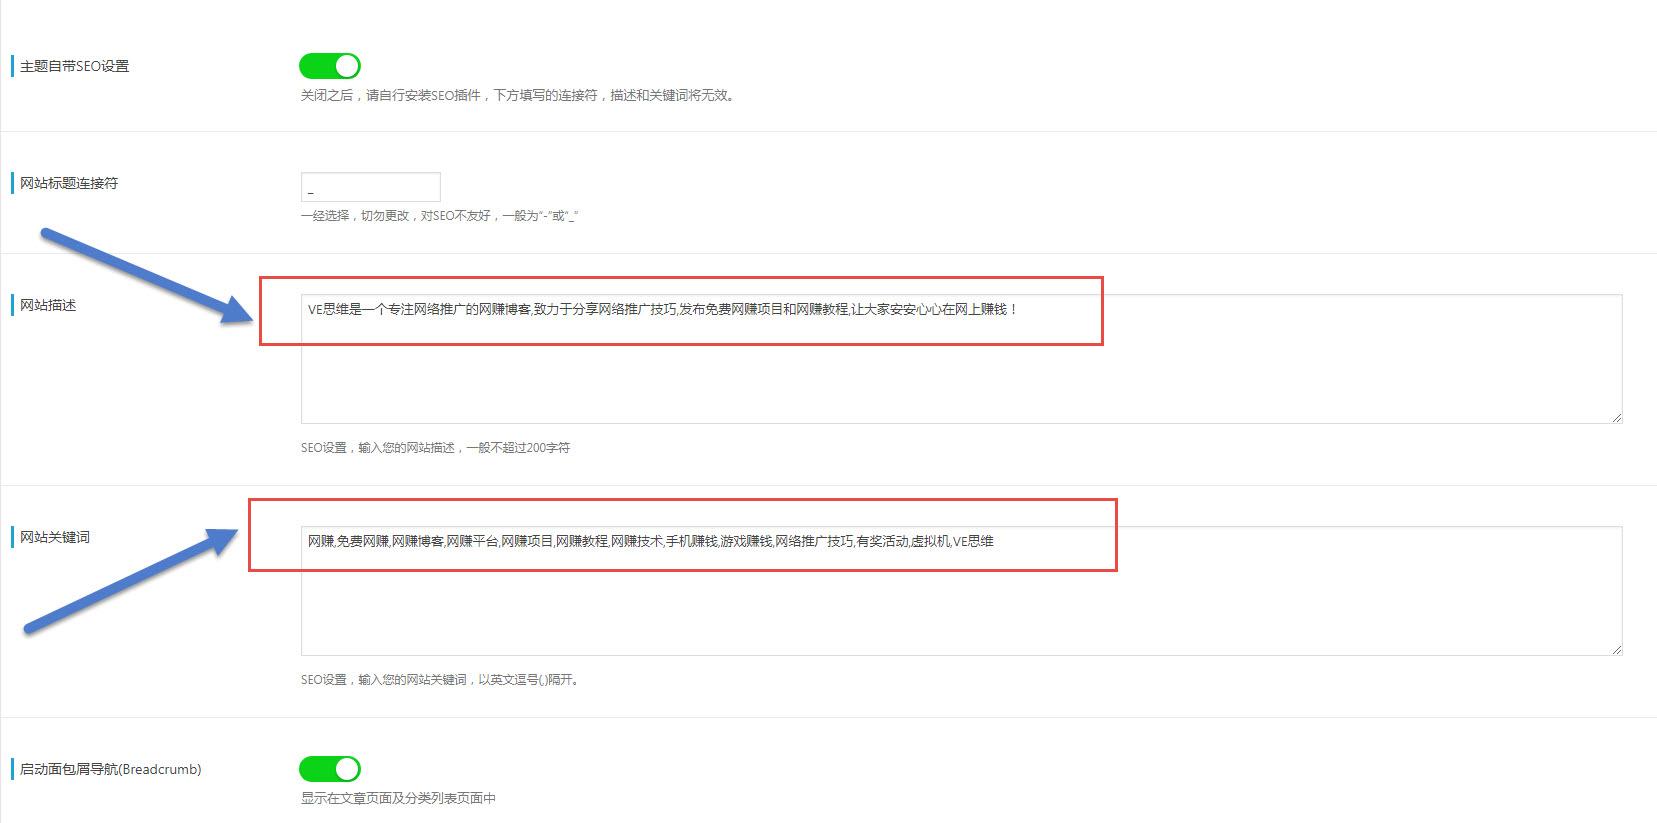 VE思维网站主页关键词描述以及关键词设置界面